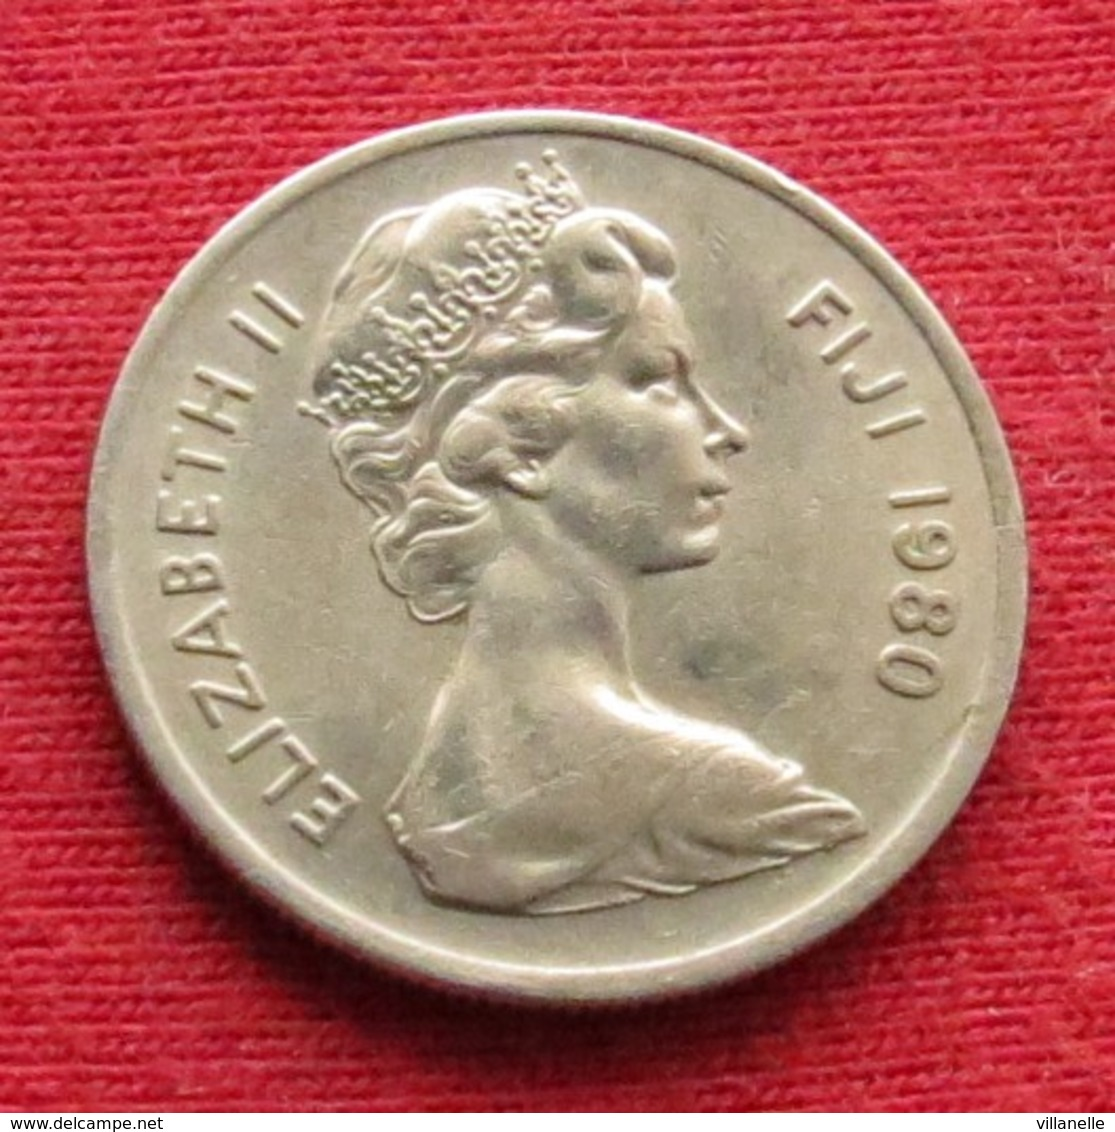 Fiji 5 Cents 1980 KM# 29 *V2 - Fiji